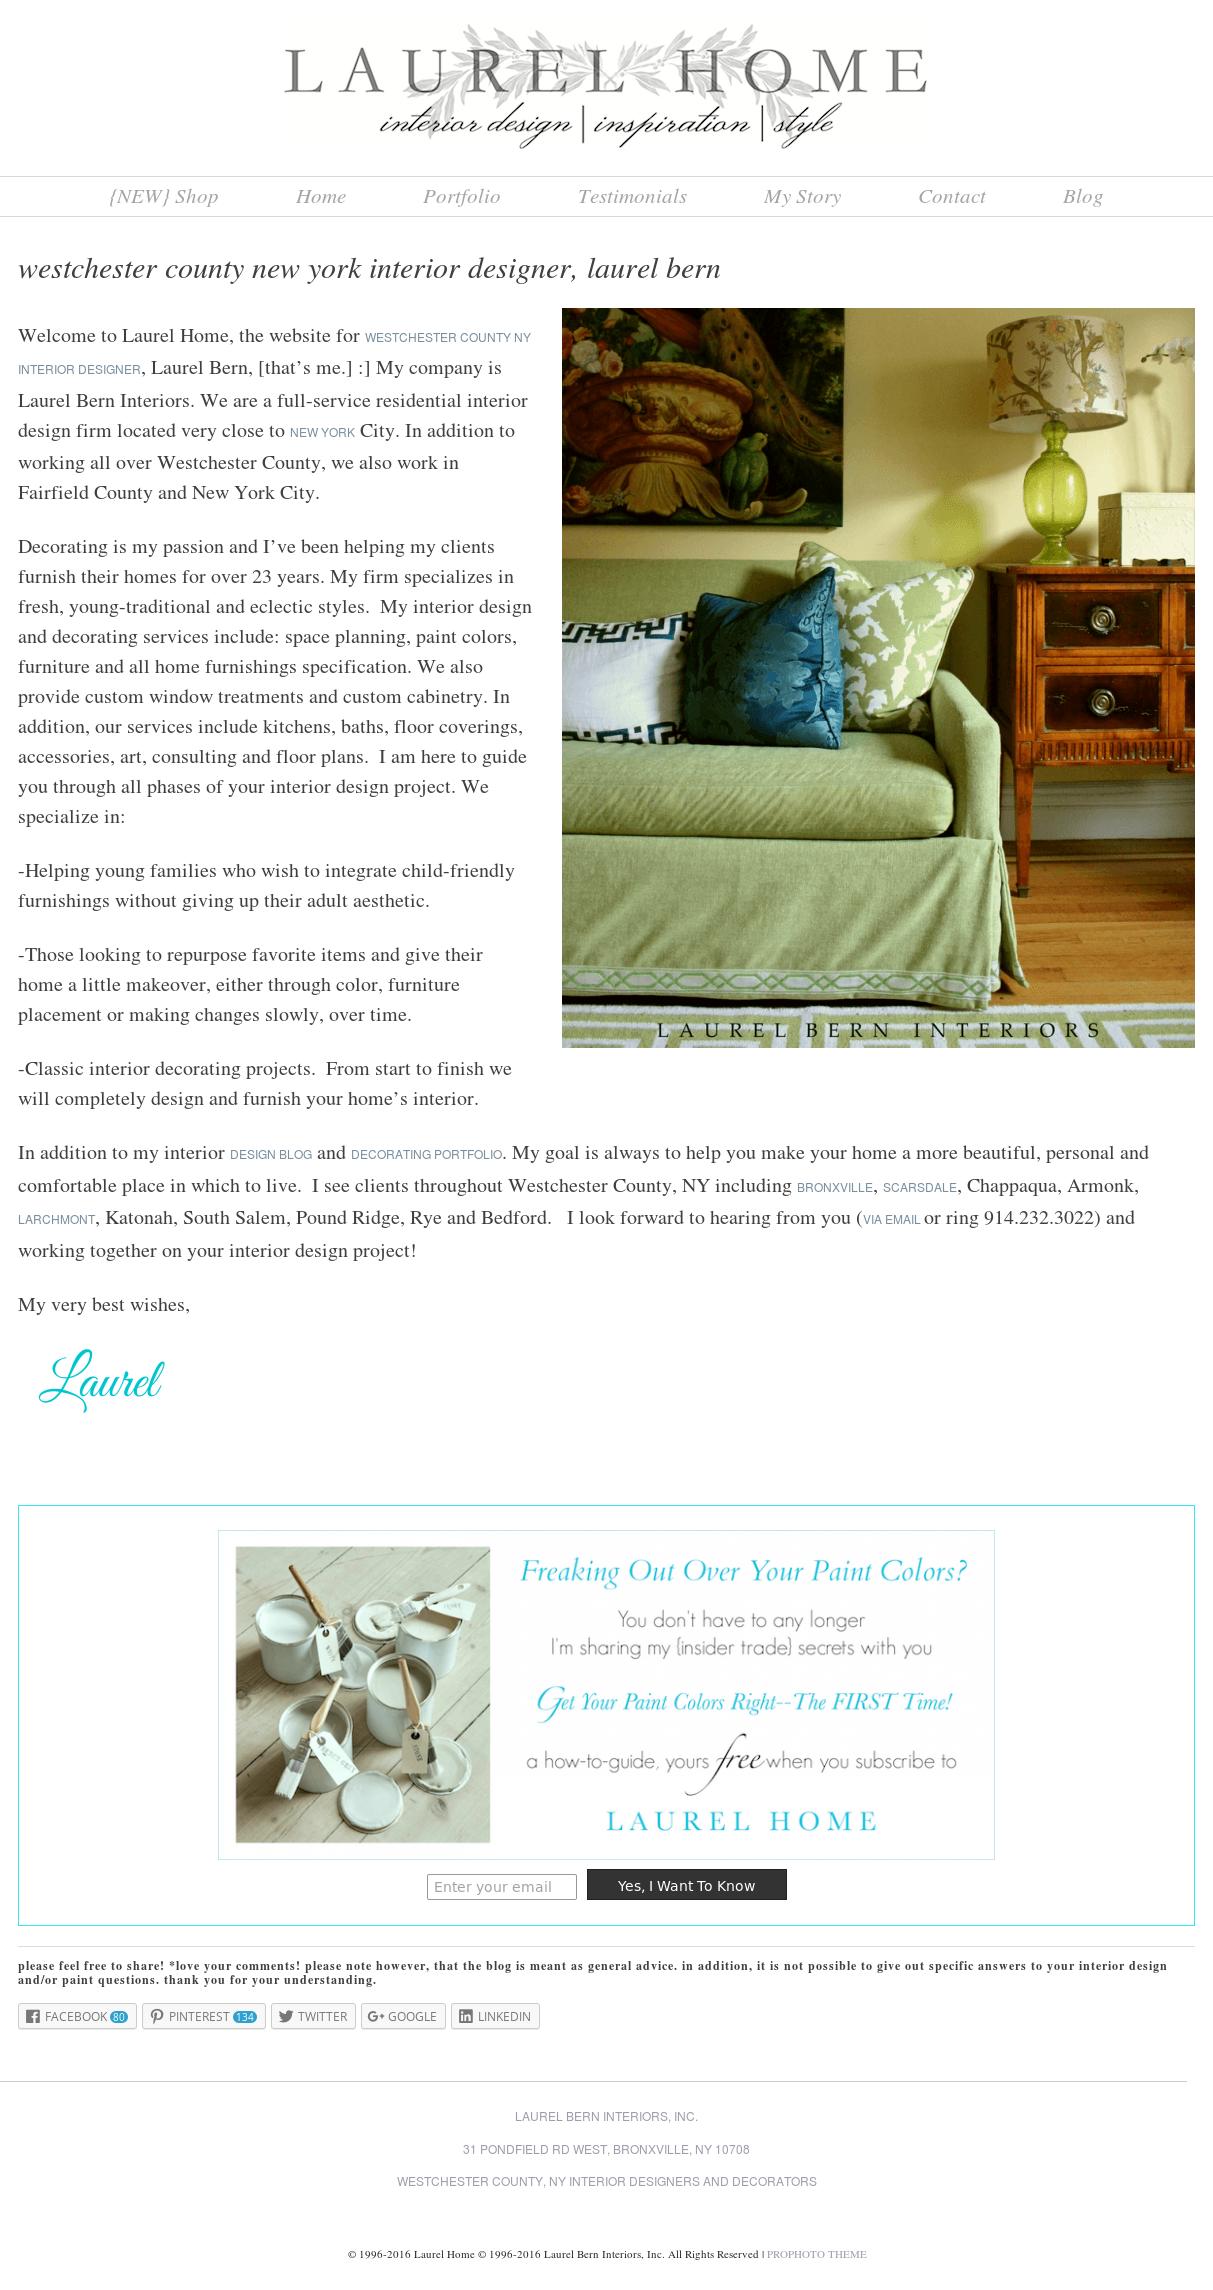 Laurel Bern Interiors Competitors, Revenue and Employees - Owler Company Profile